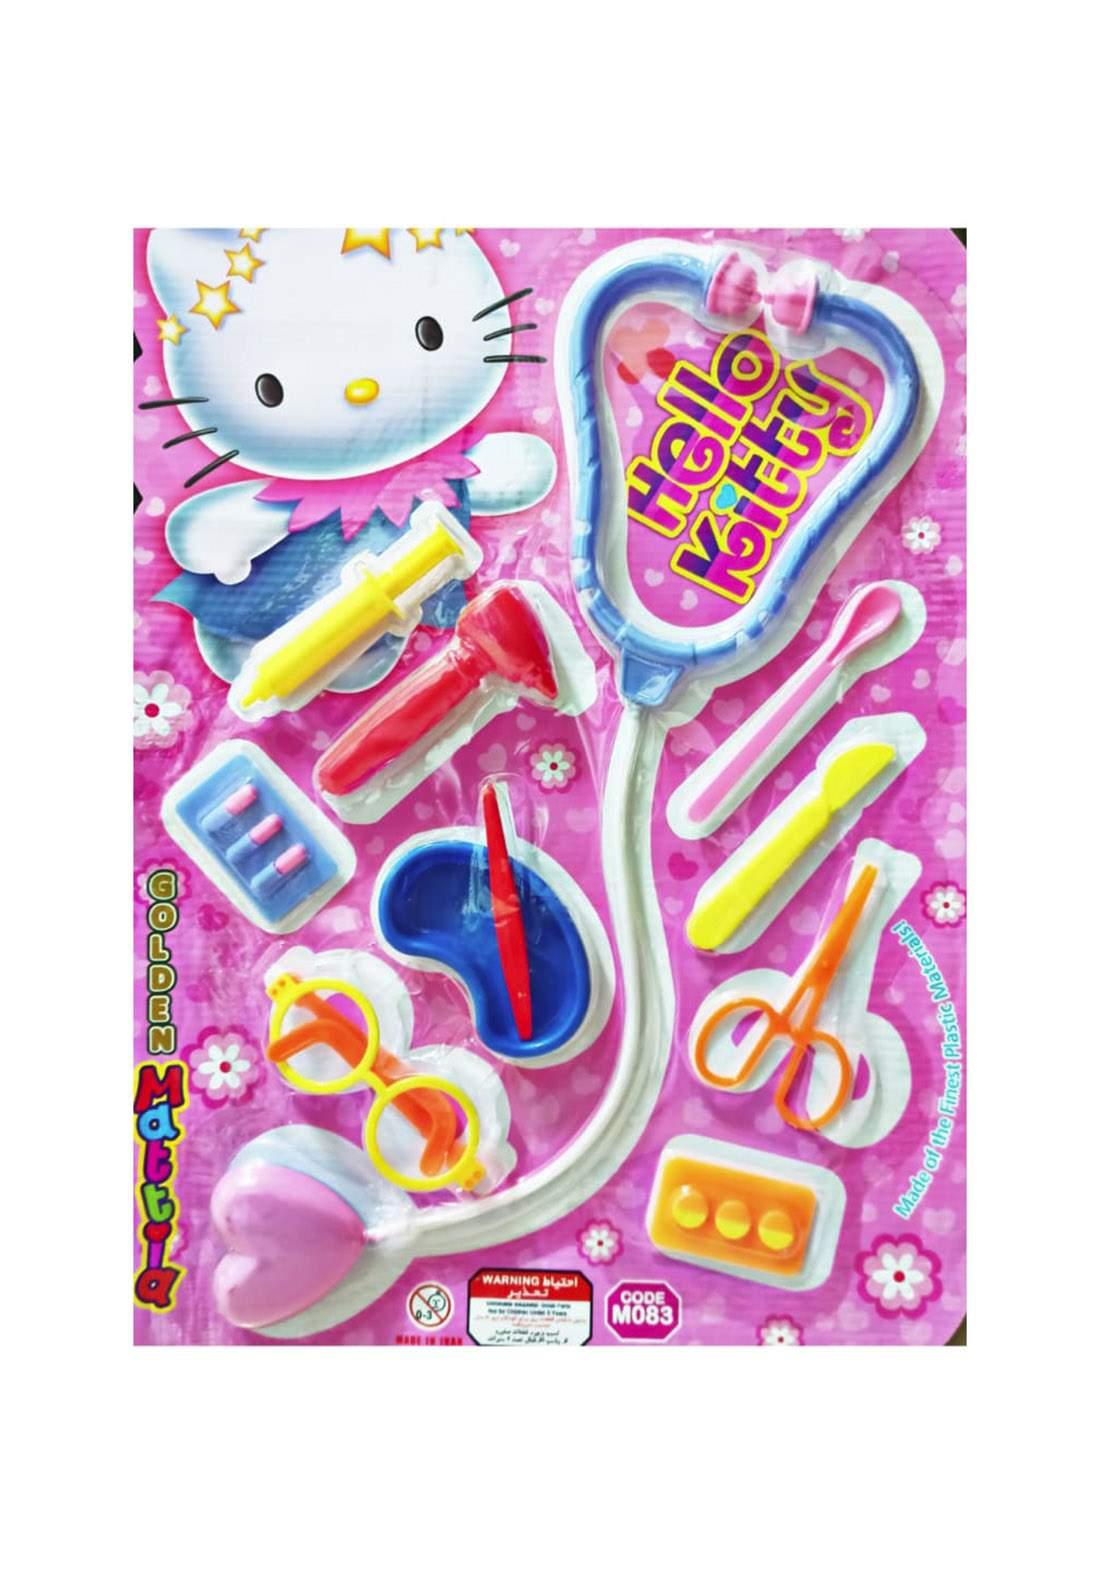 Golden Mattia  M083  Doctor set toys لعبة للأطفال